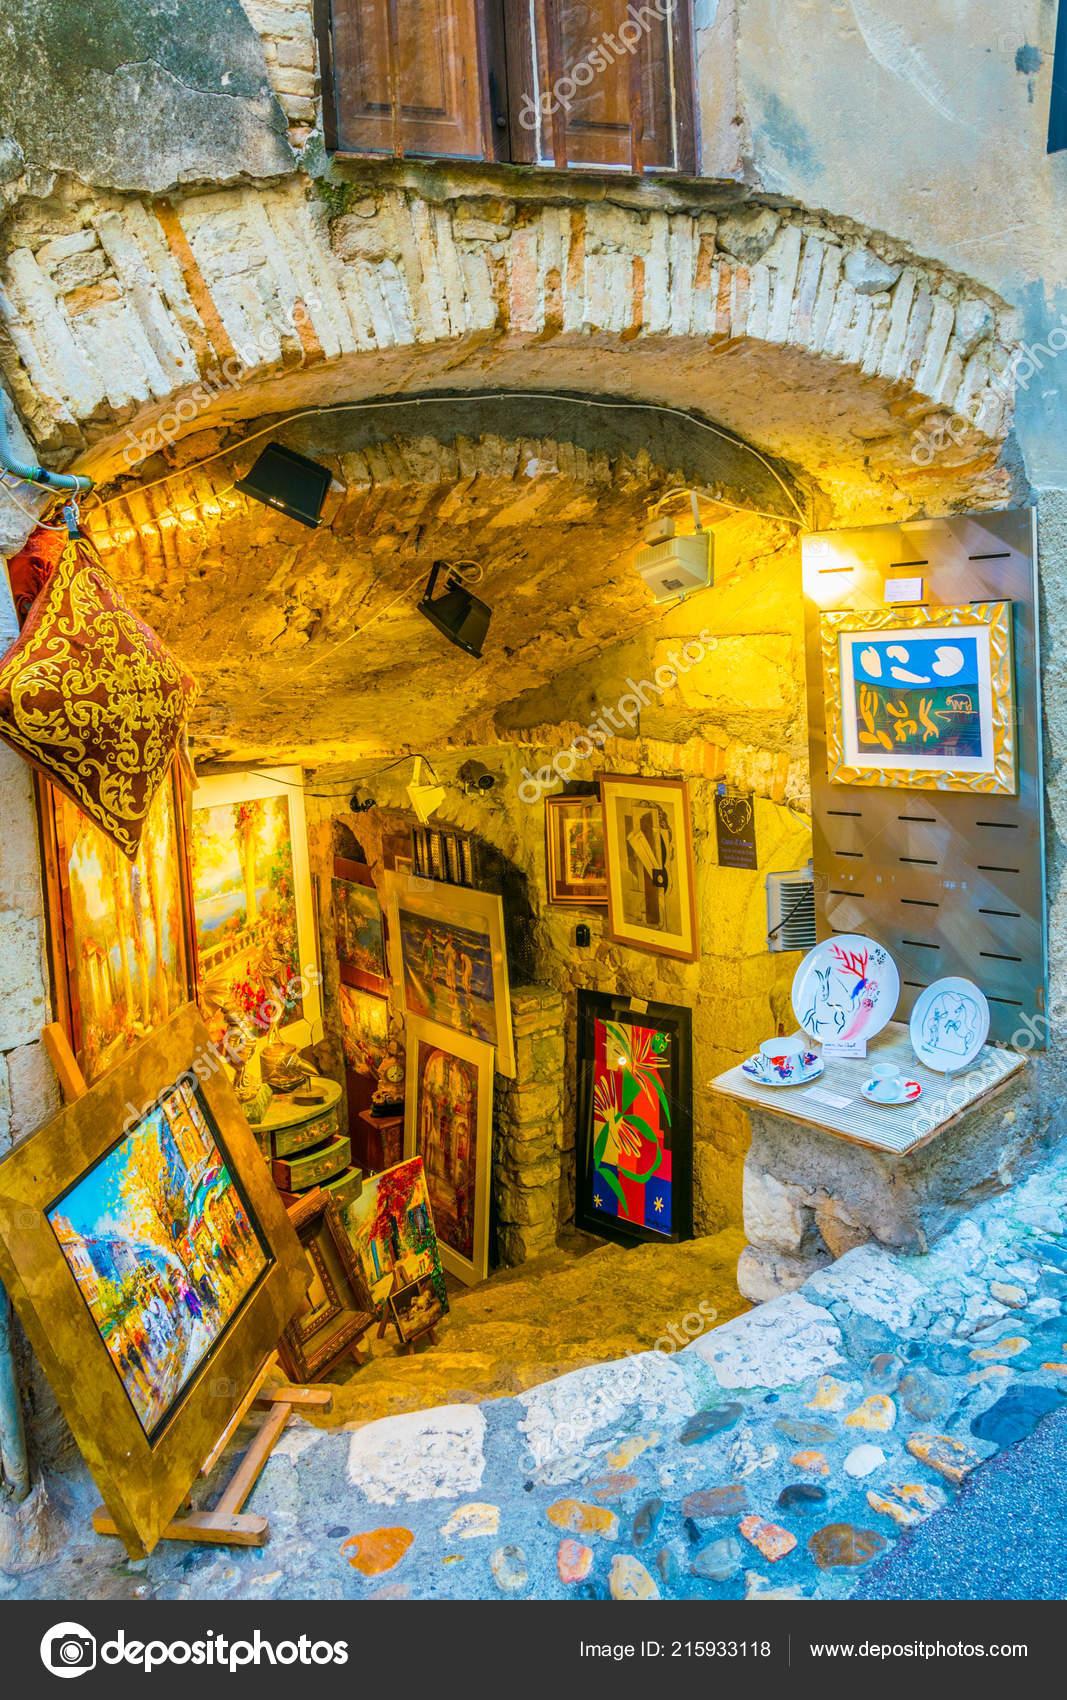 Saint Paul De Vence Art saint paul vence france june 2017 narrow street old town